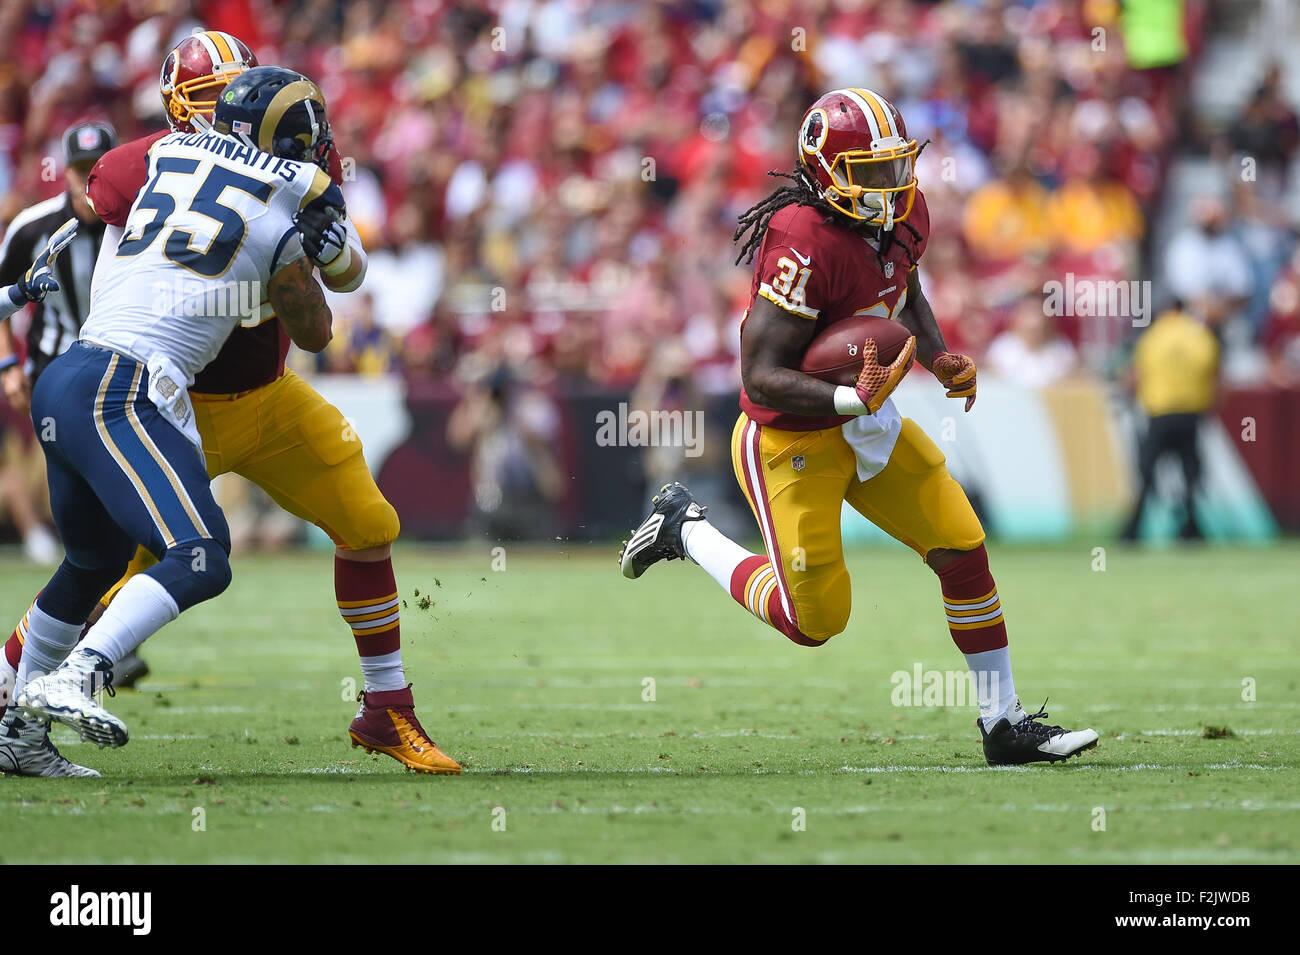 Landover, MD., USA. 20 Septembre, 2015. Redskins de Washington d'utiliser de nouveau Matt Jones (31) exécute Photo Stock